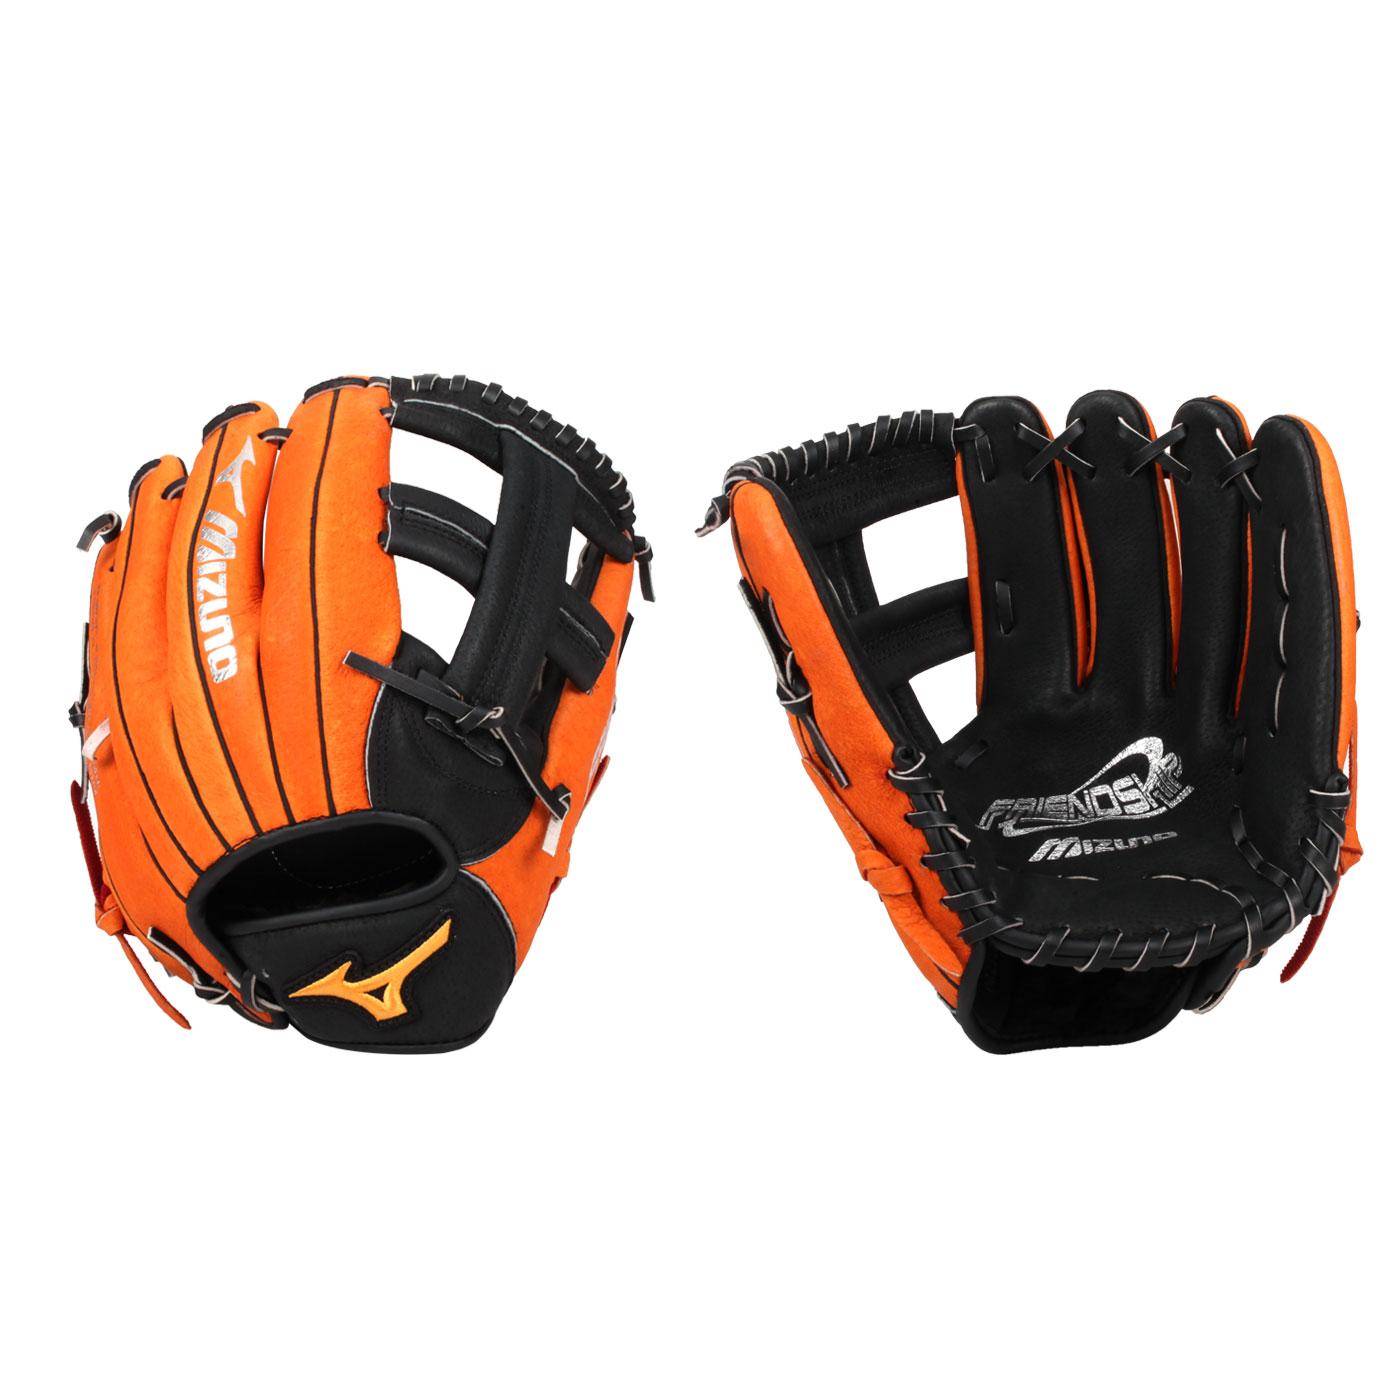 MIZUNO 壘球手套 1ATGS21900-0951